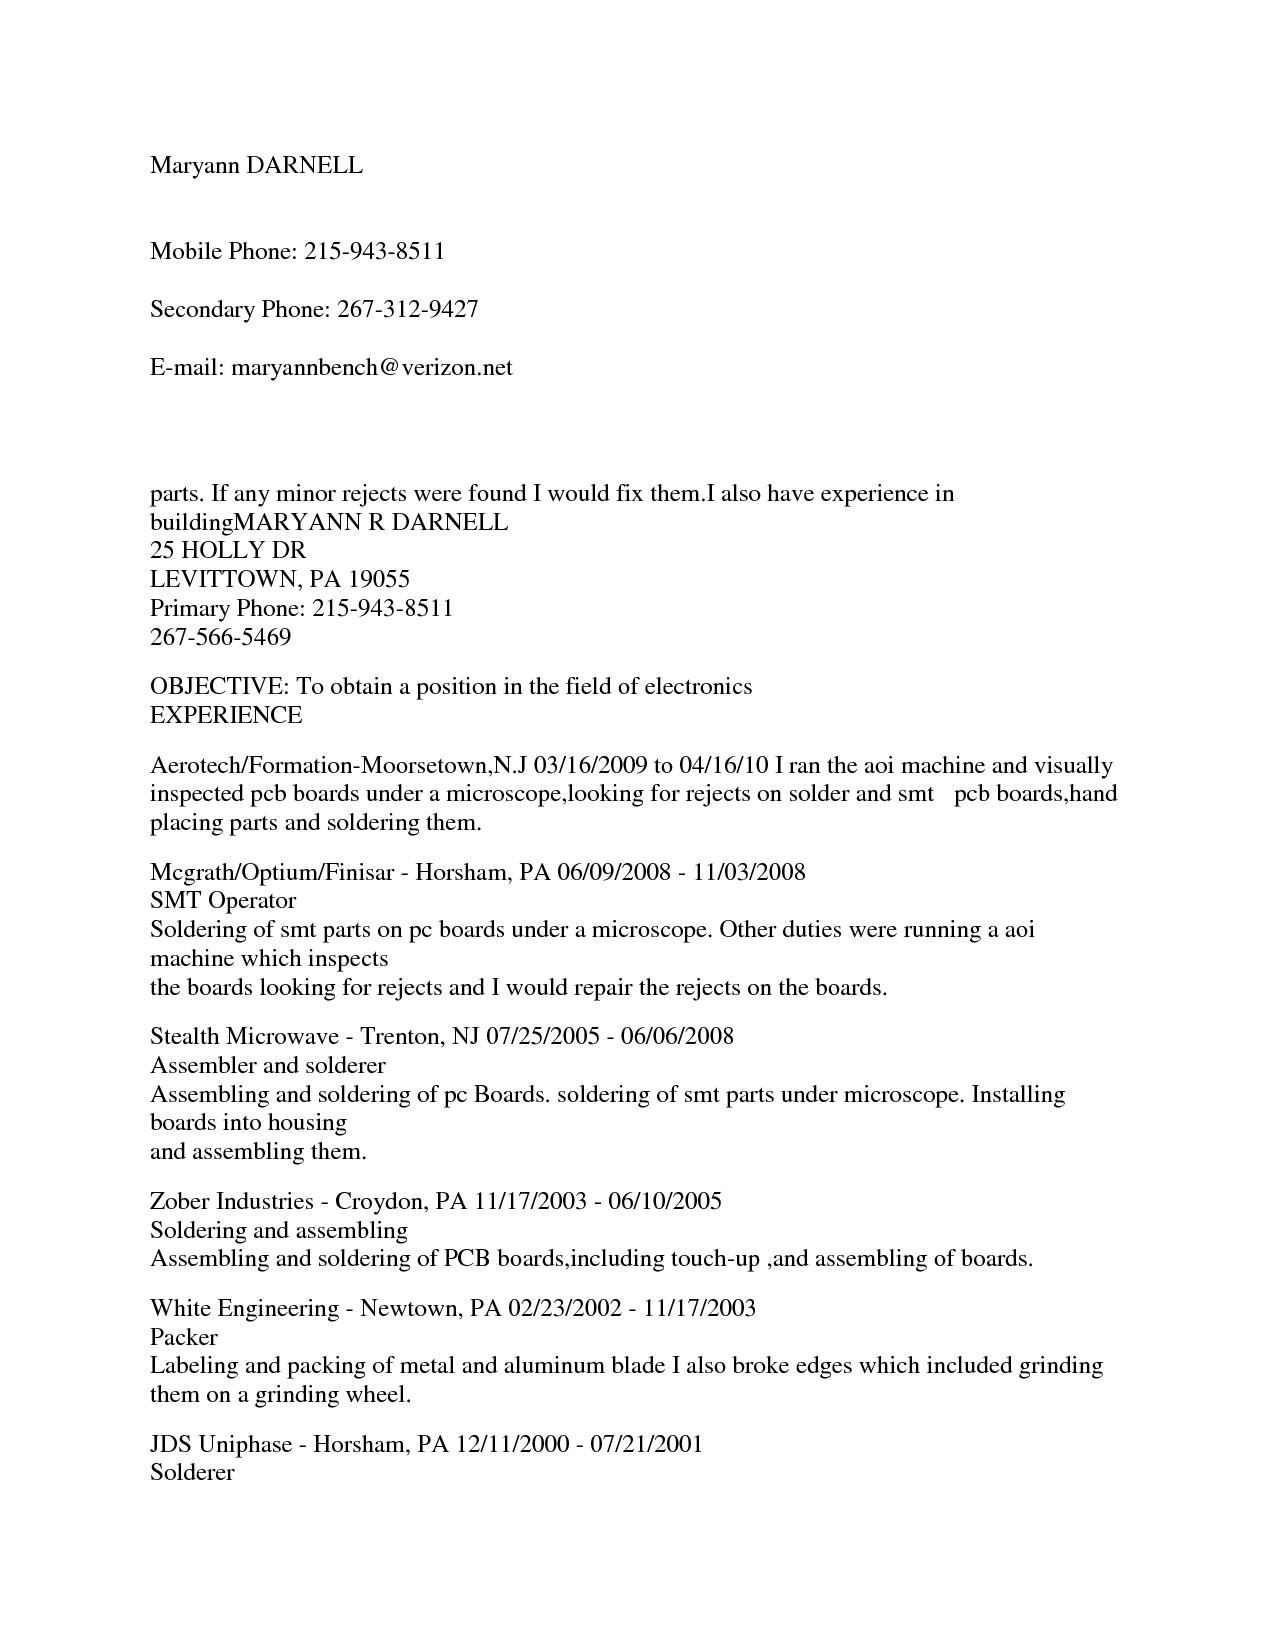 Electronic Assembler Resume Sample - Contegri.com